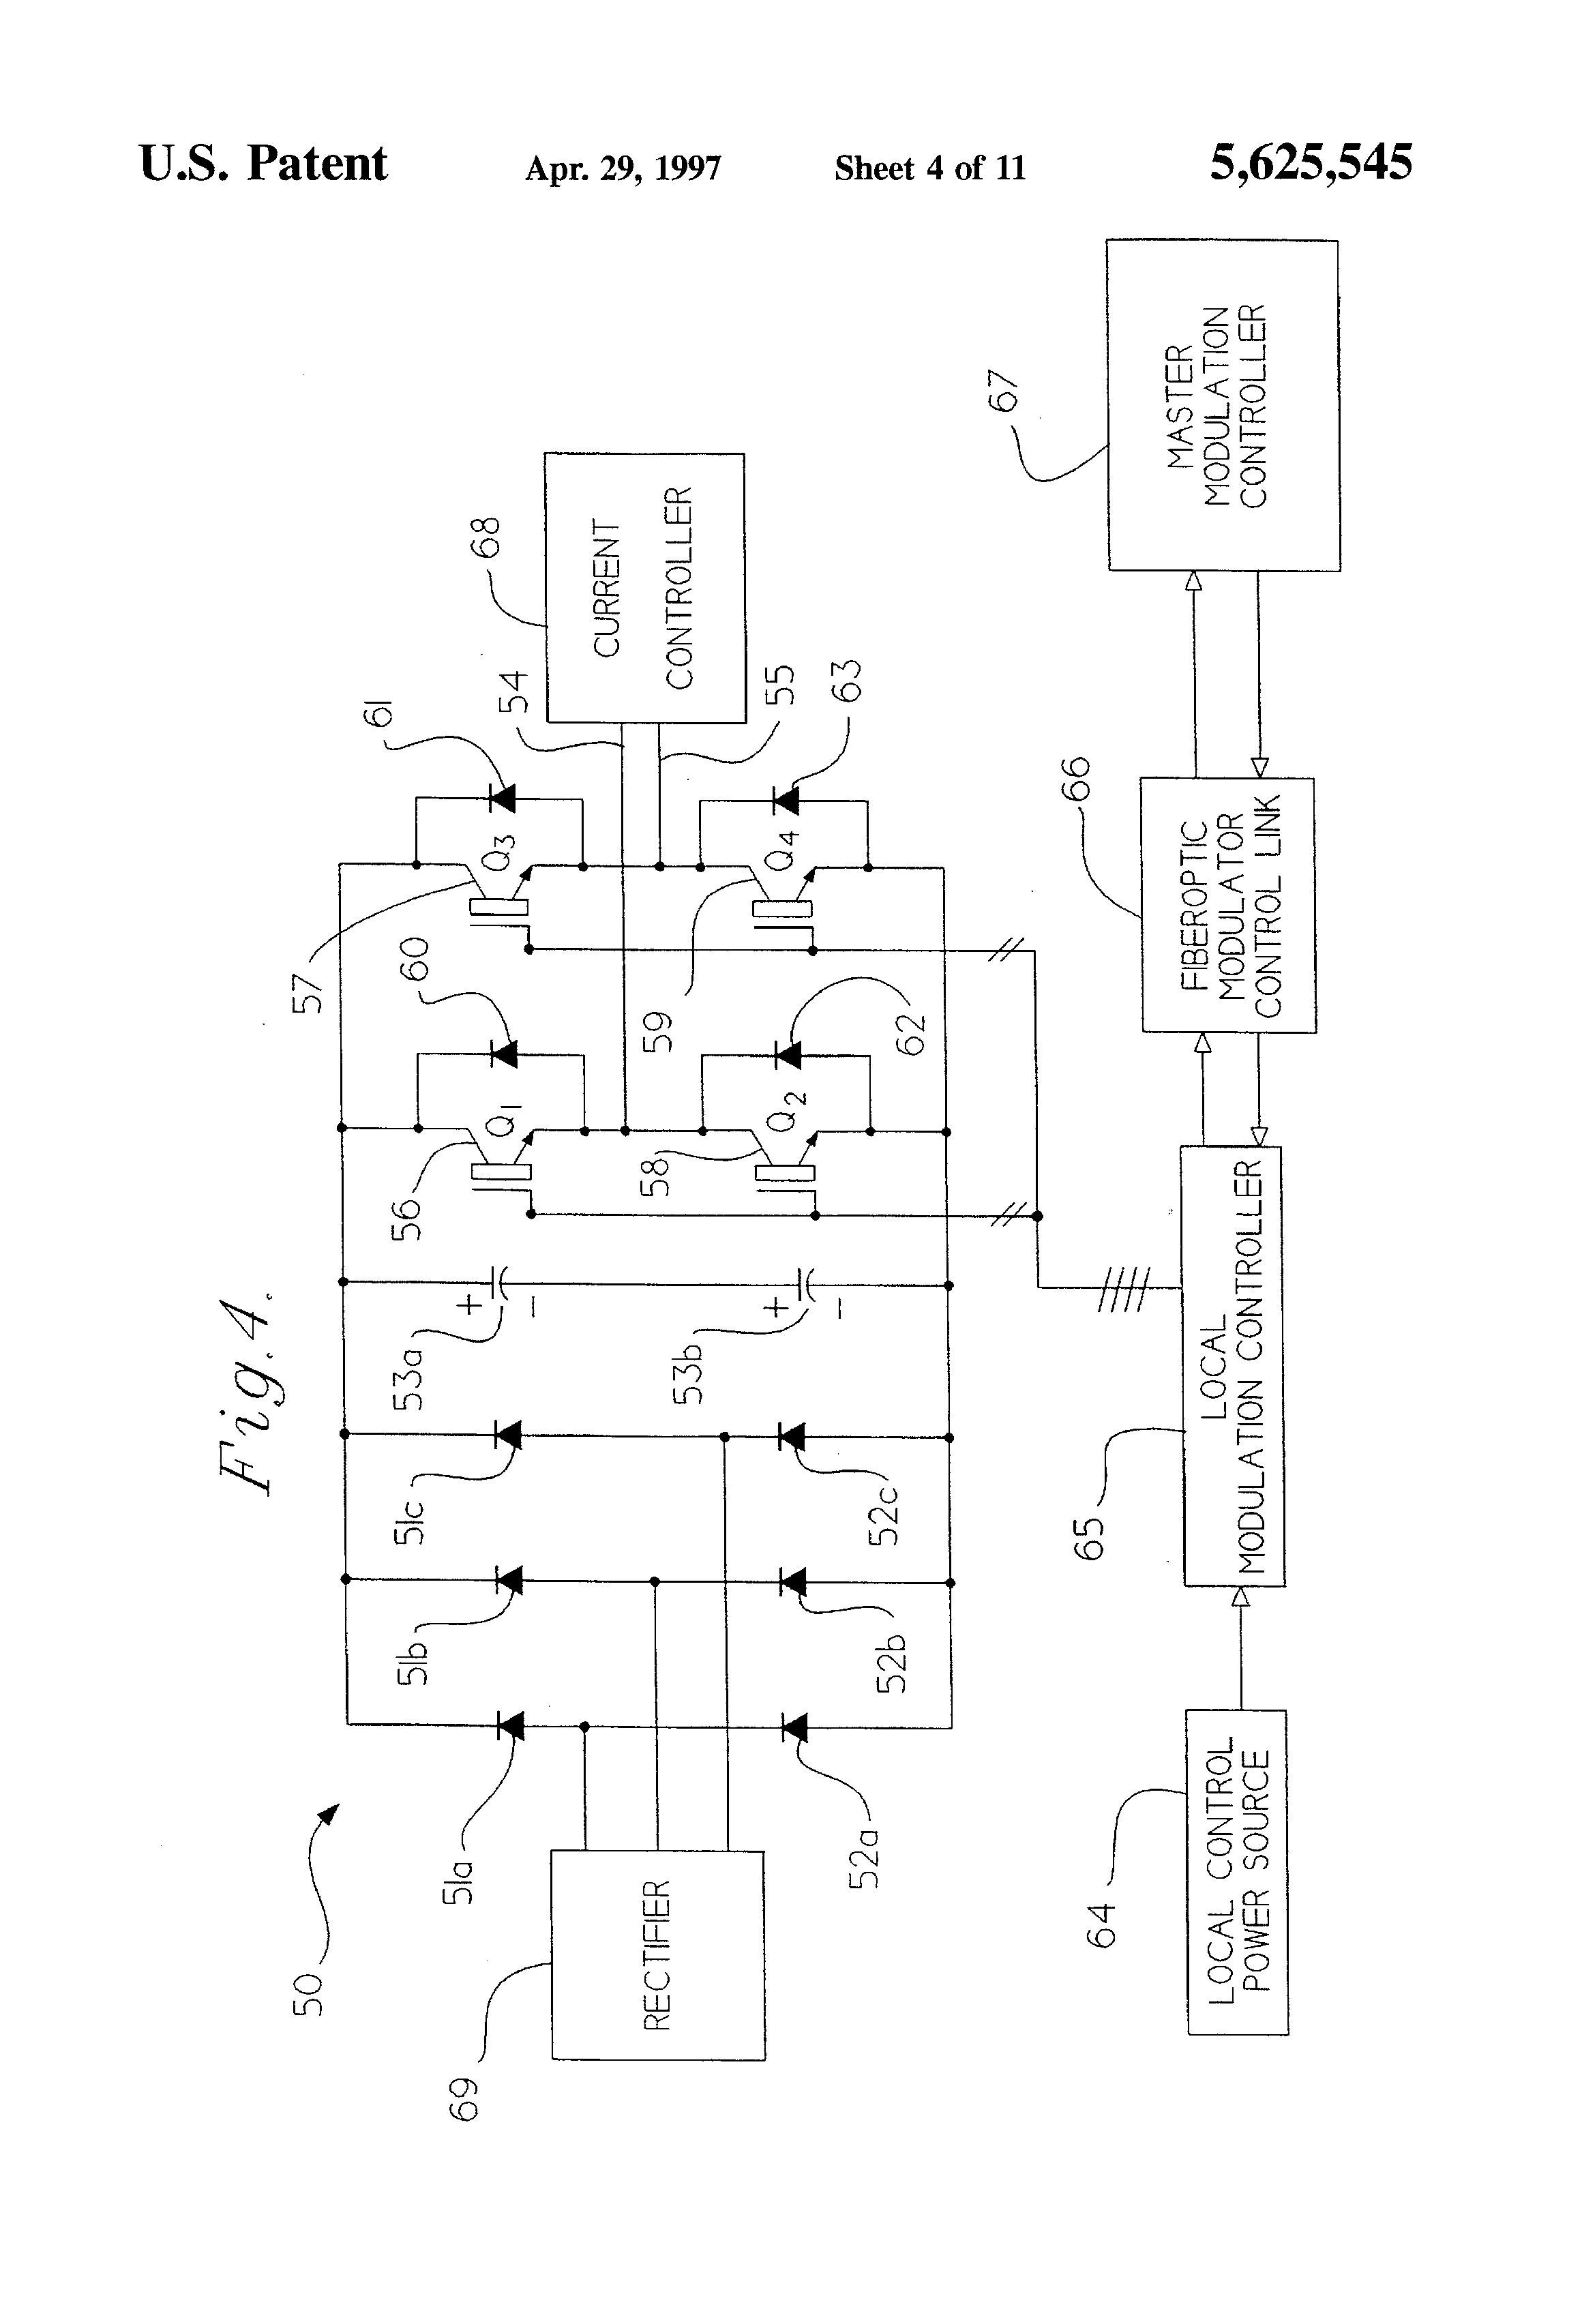 teco westinghouse motor data motorssite org rh motorssite org westinghouse 3 phase motor wiring diagram westinghouse ac motor wiring diagram